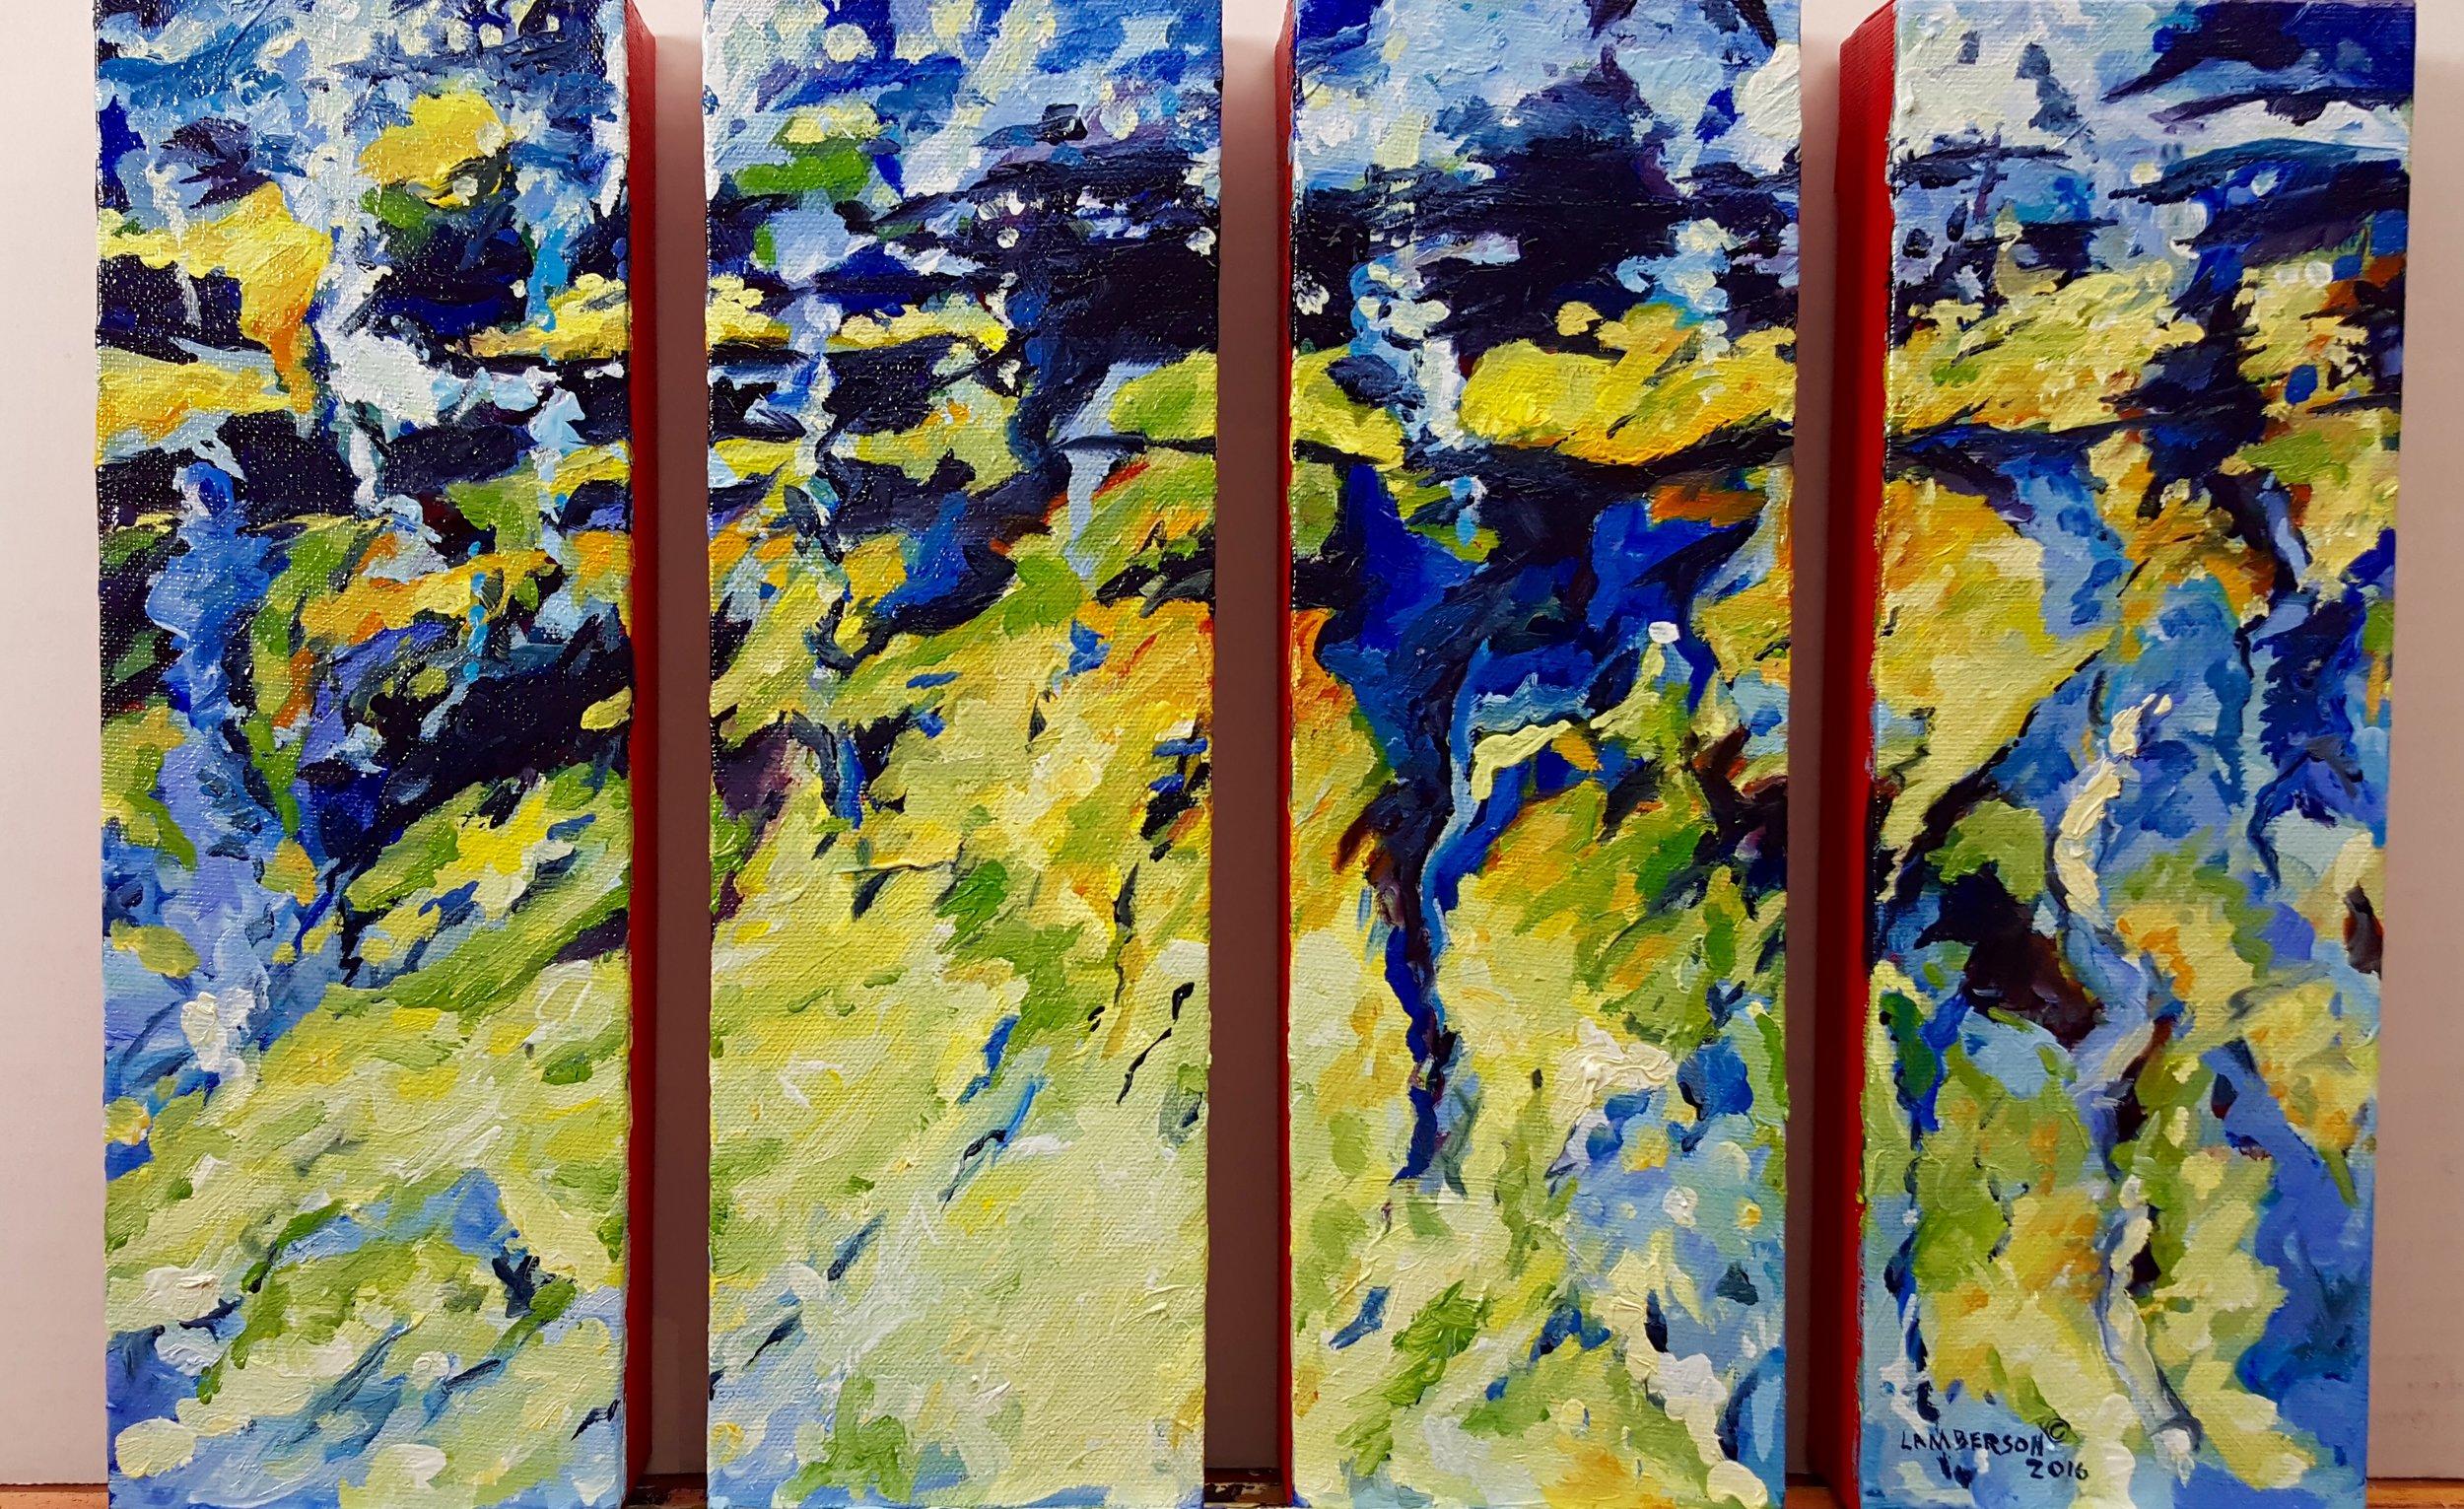 Indulgent Reflections (Joy of Paint)